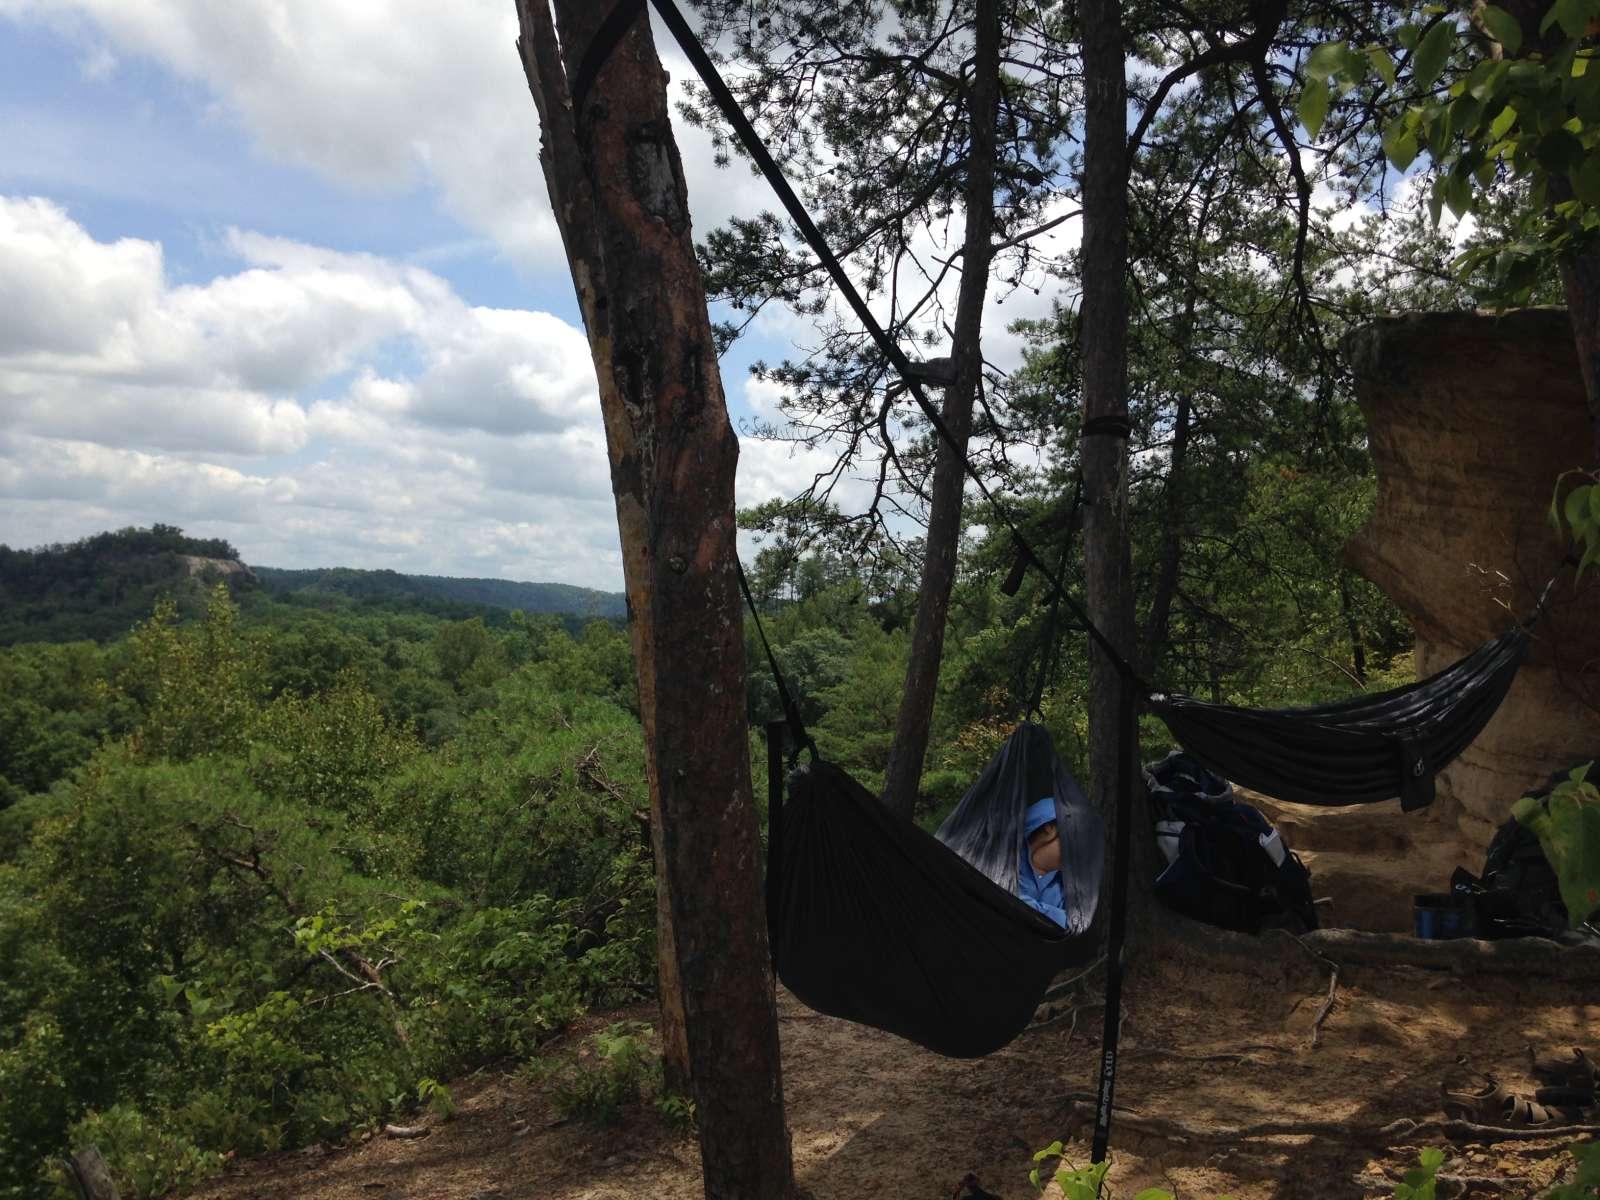 Koomer Ridge Campground Daniel Boone Ky 1 Hipcamper